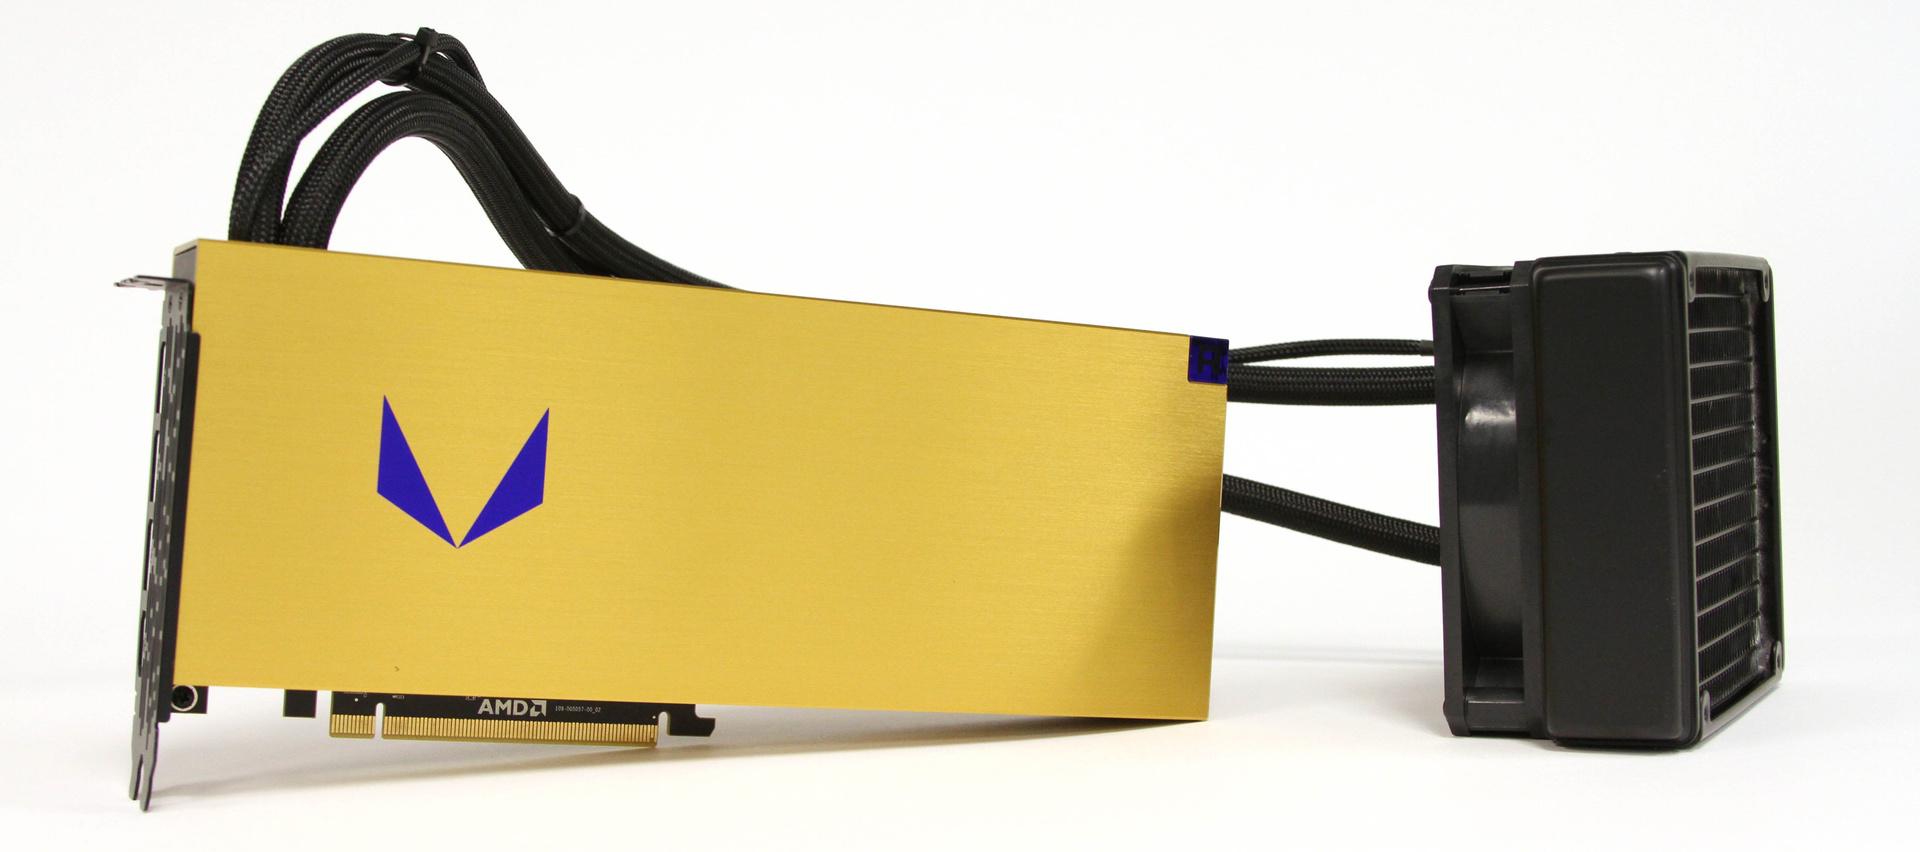 AMD Vega Frontier Edition (FE) Liquid Cooled Hashrate